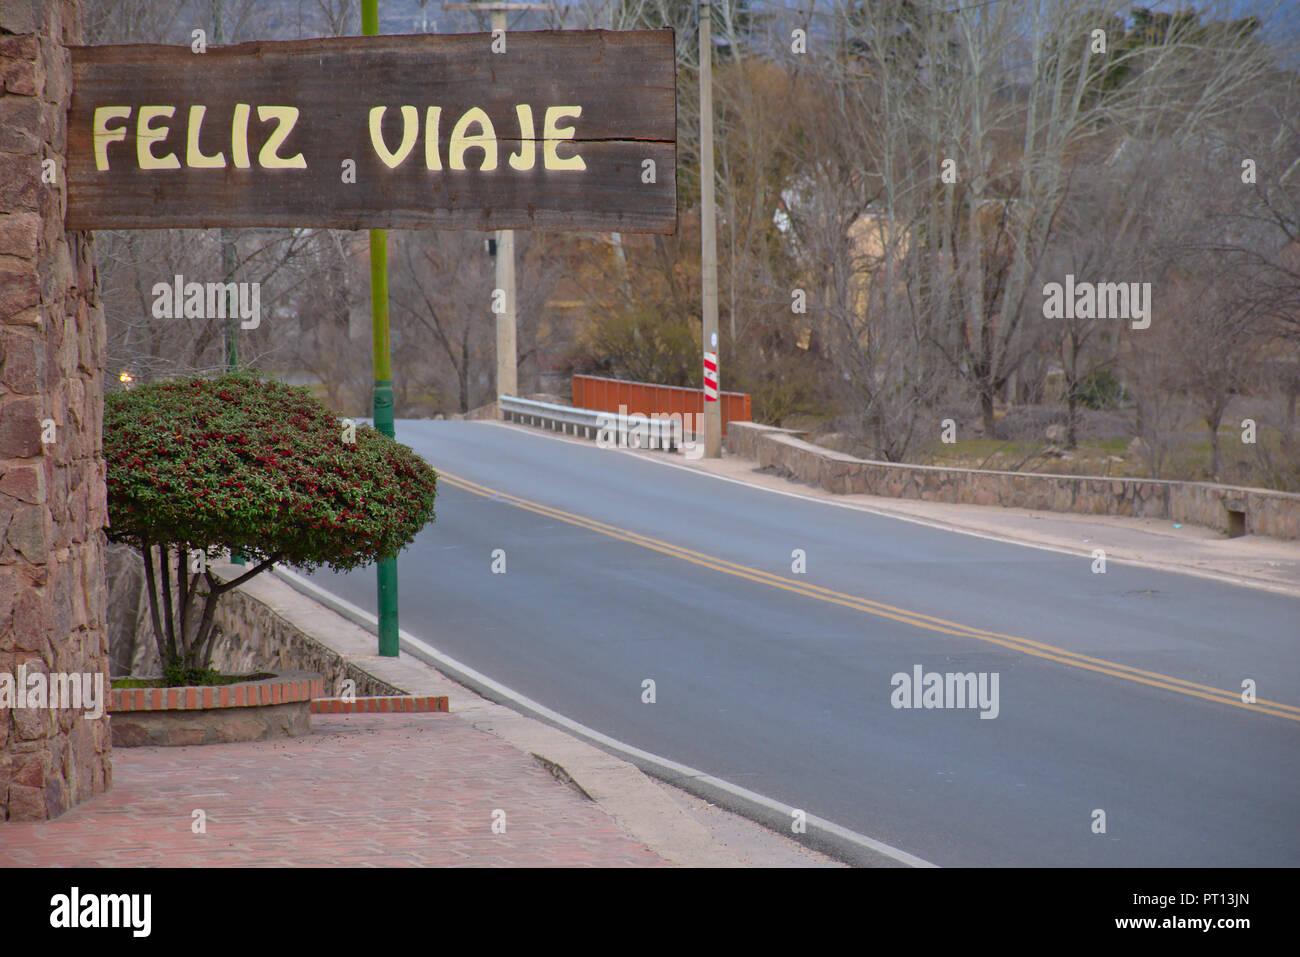 """Feliz viaje"" (Buen Viaje) firmar sobre una carretera en Mina Clavero - provincia de Córdoba - Argentina Imagen De Stock"